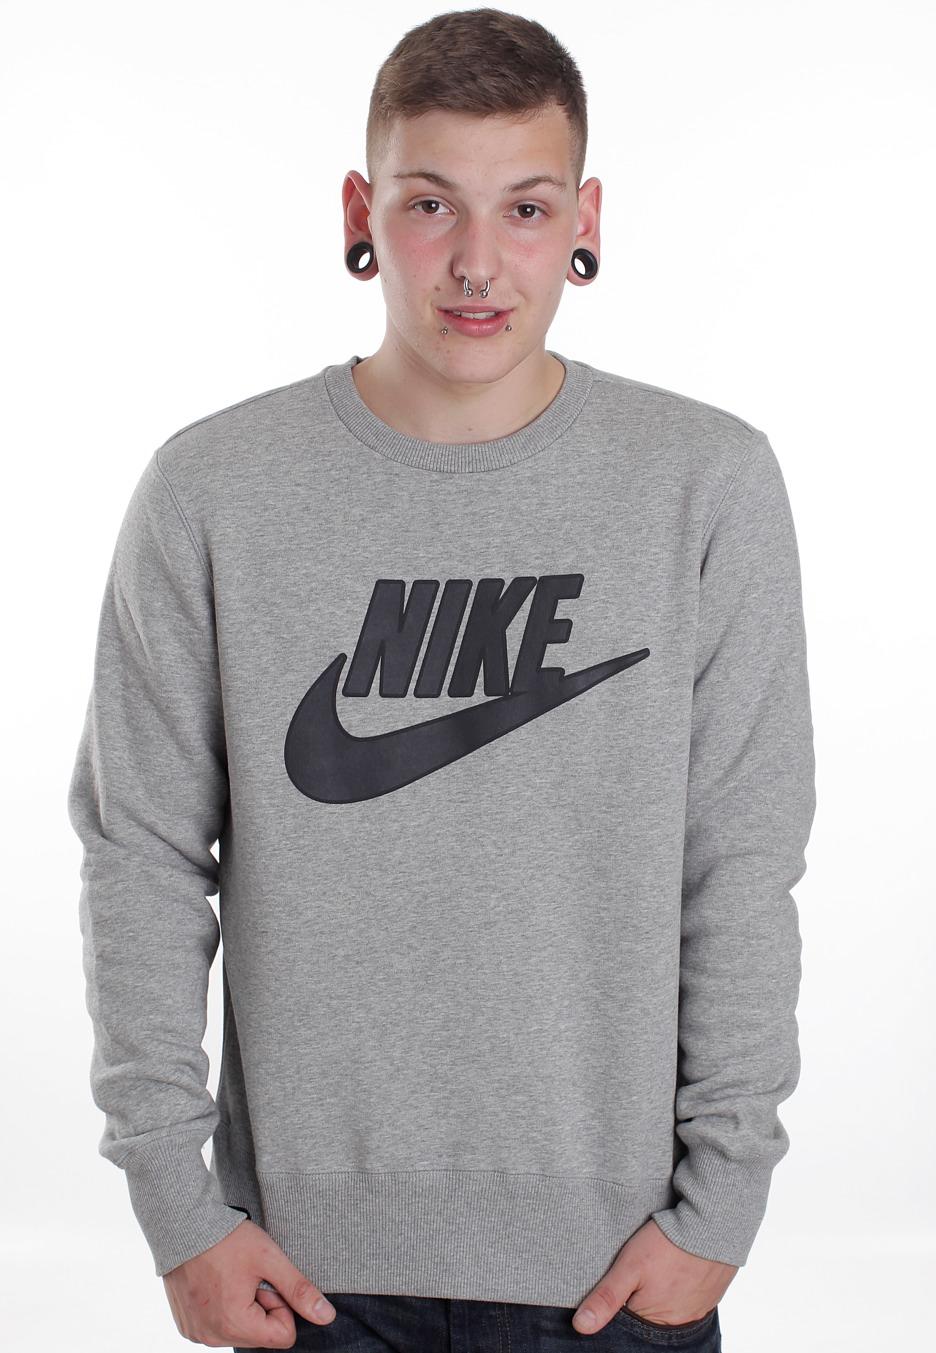 Nike - Brushed Dark Grey Heather - Sweater - Streetwear Online Shop - Impericon.com Worldwide